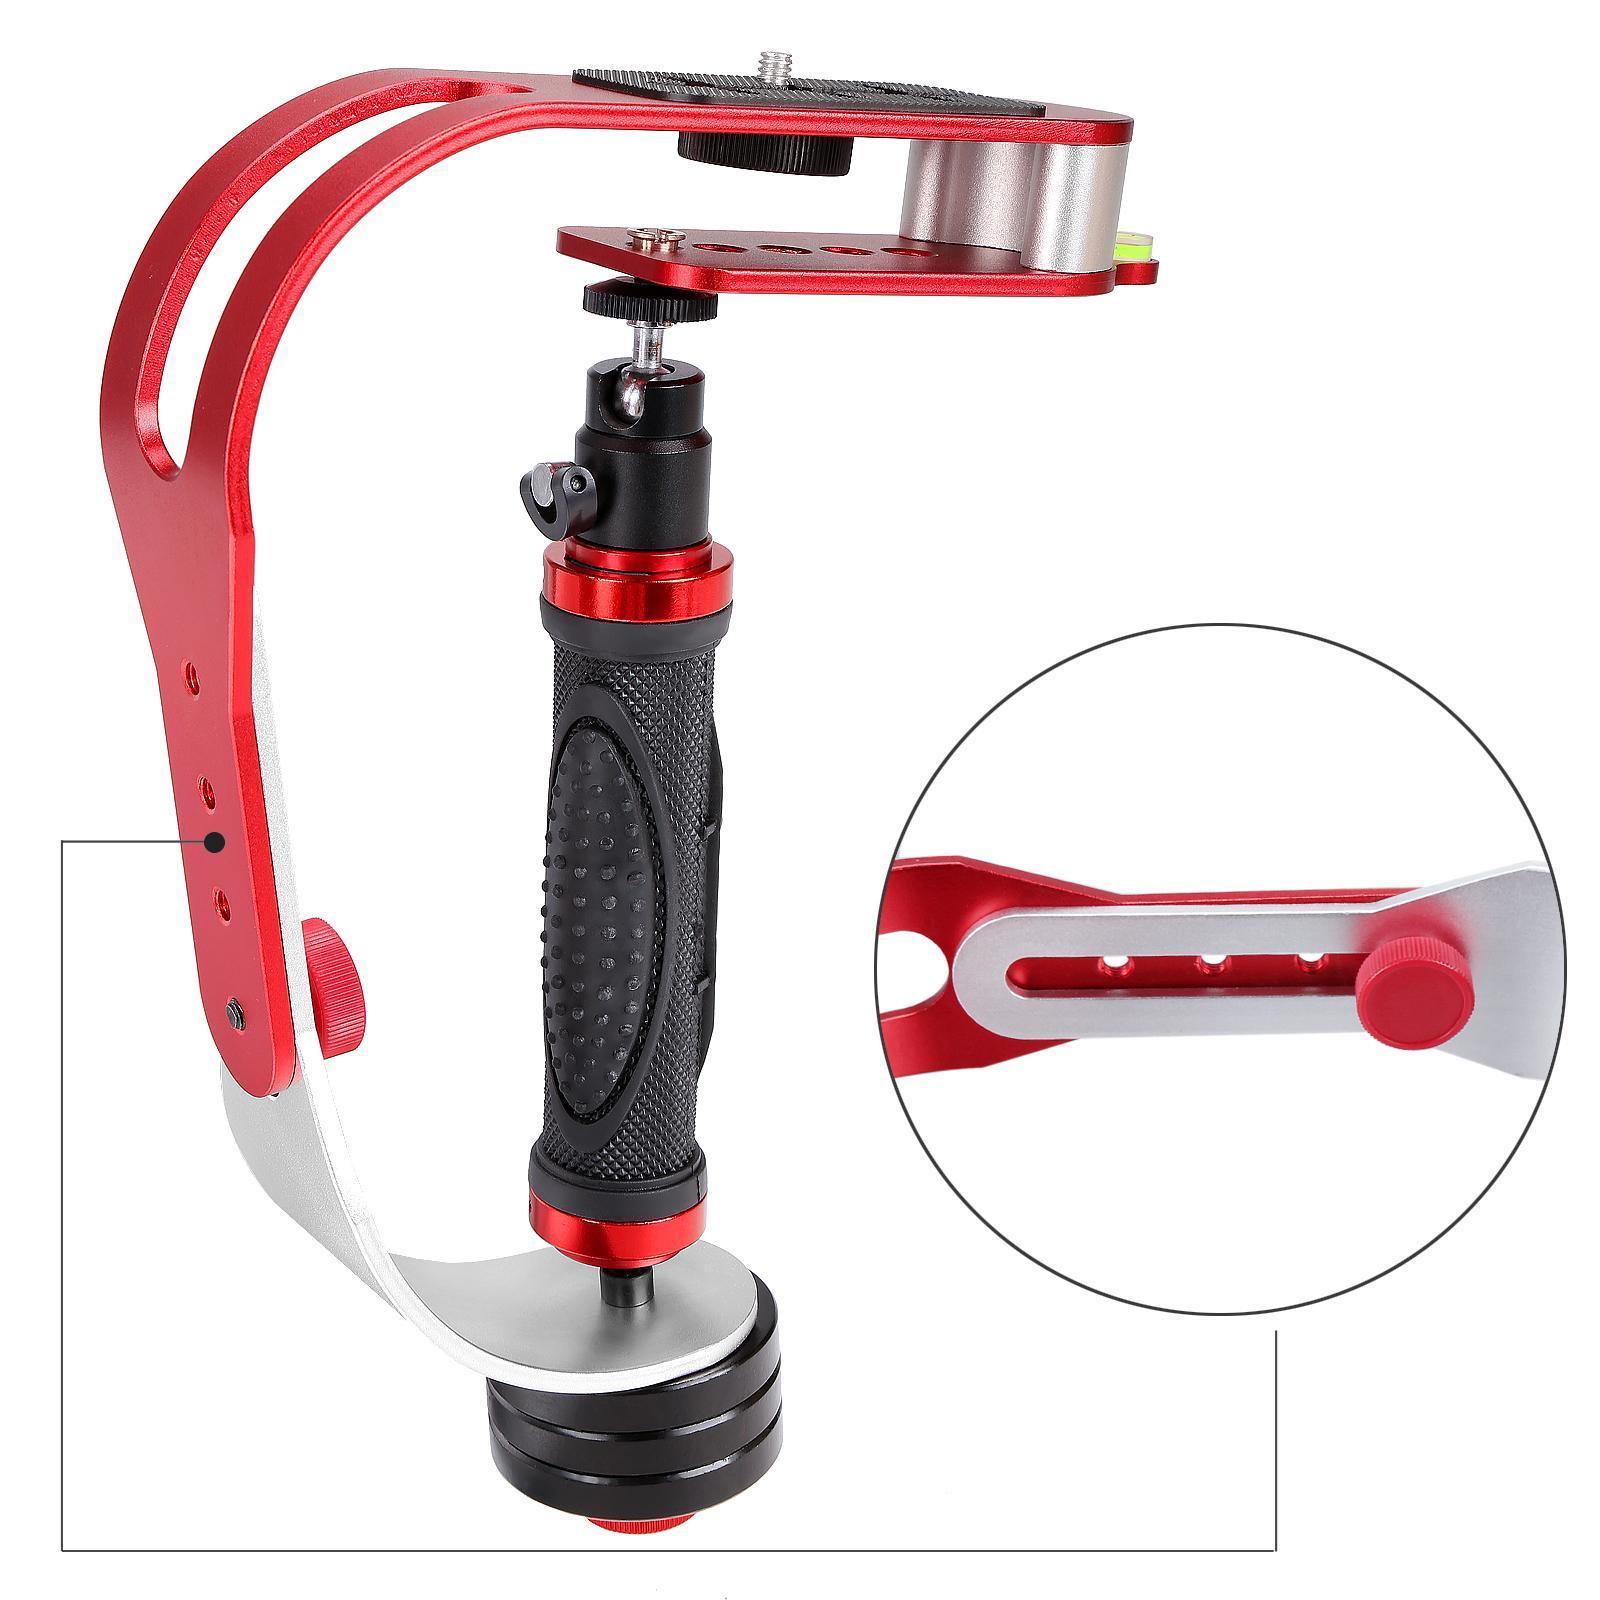 Hand-held Steady Cam Video Stabilizer Motion Steadicam Cam For DSLR Camera Camcorder 2